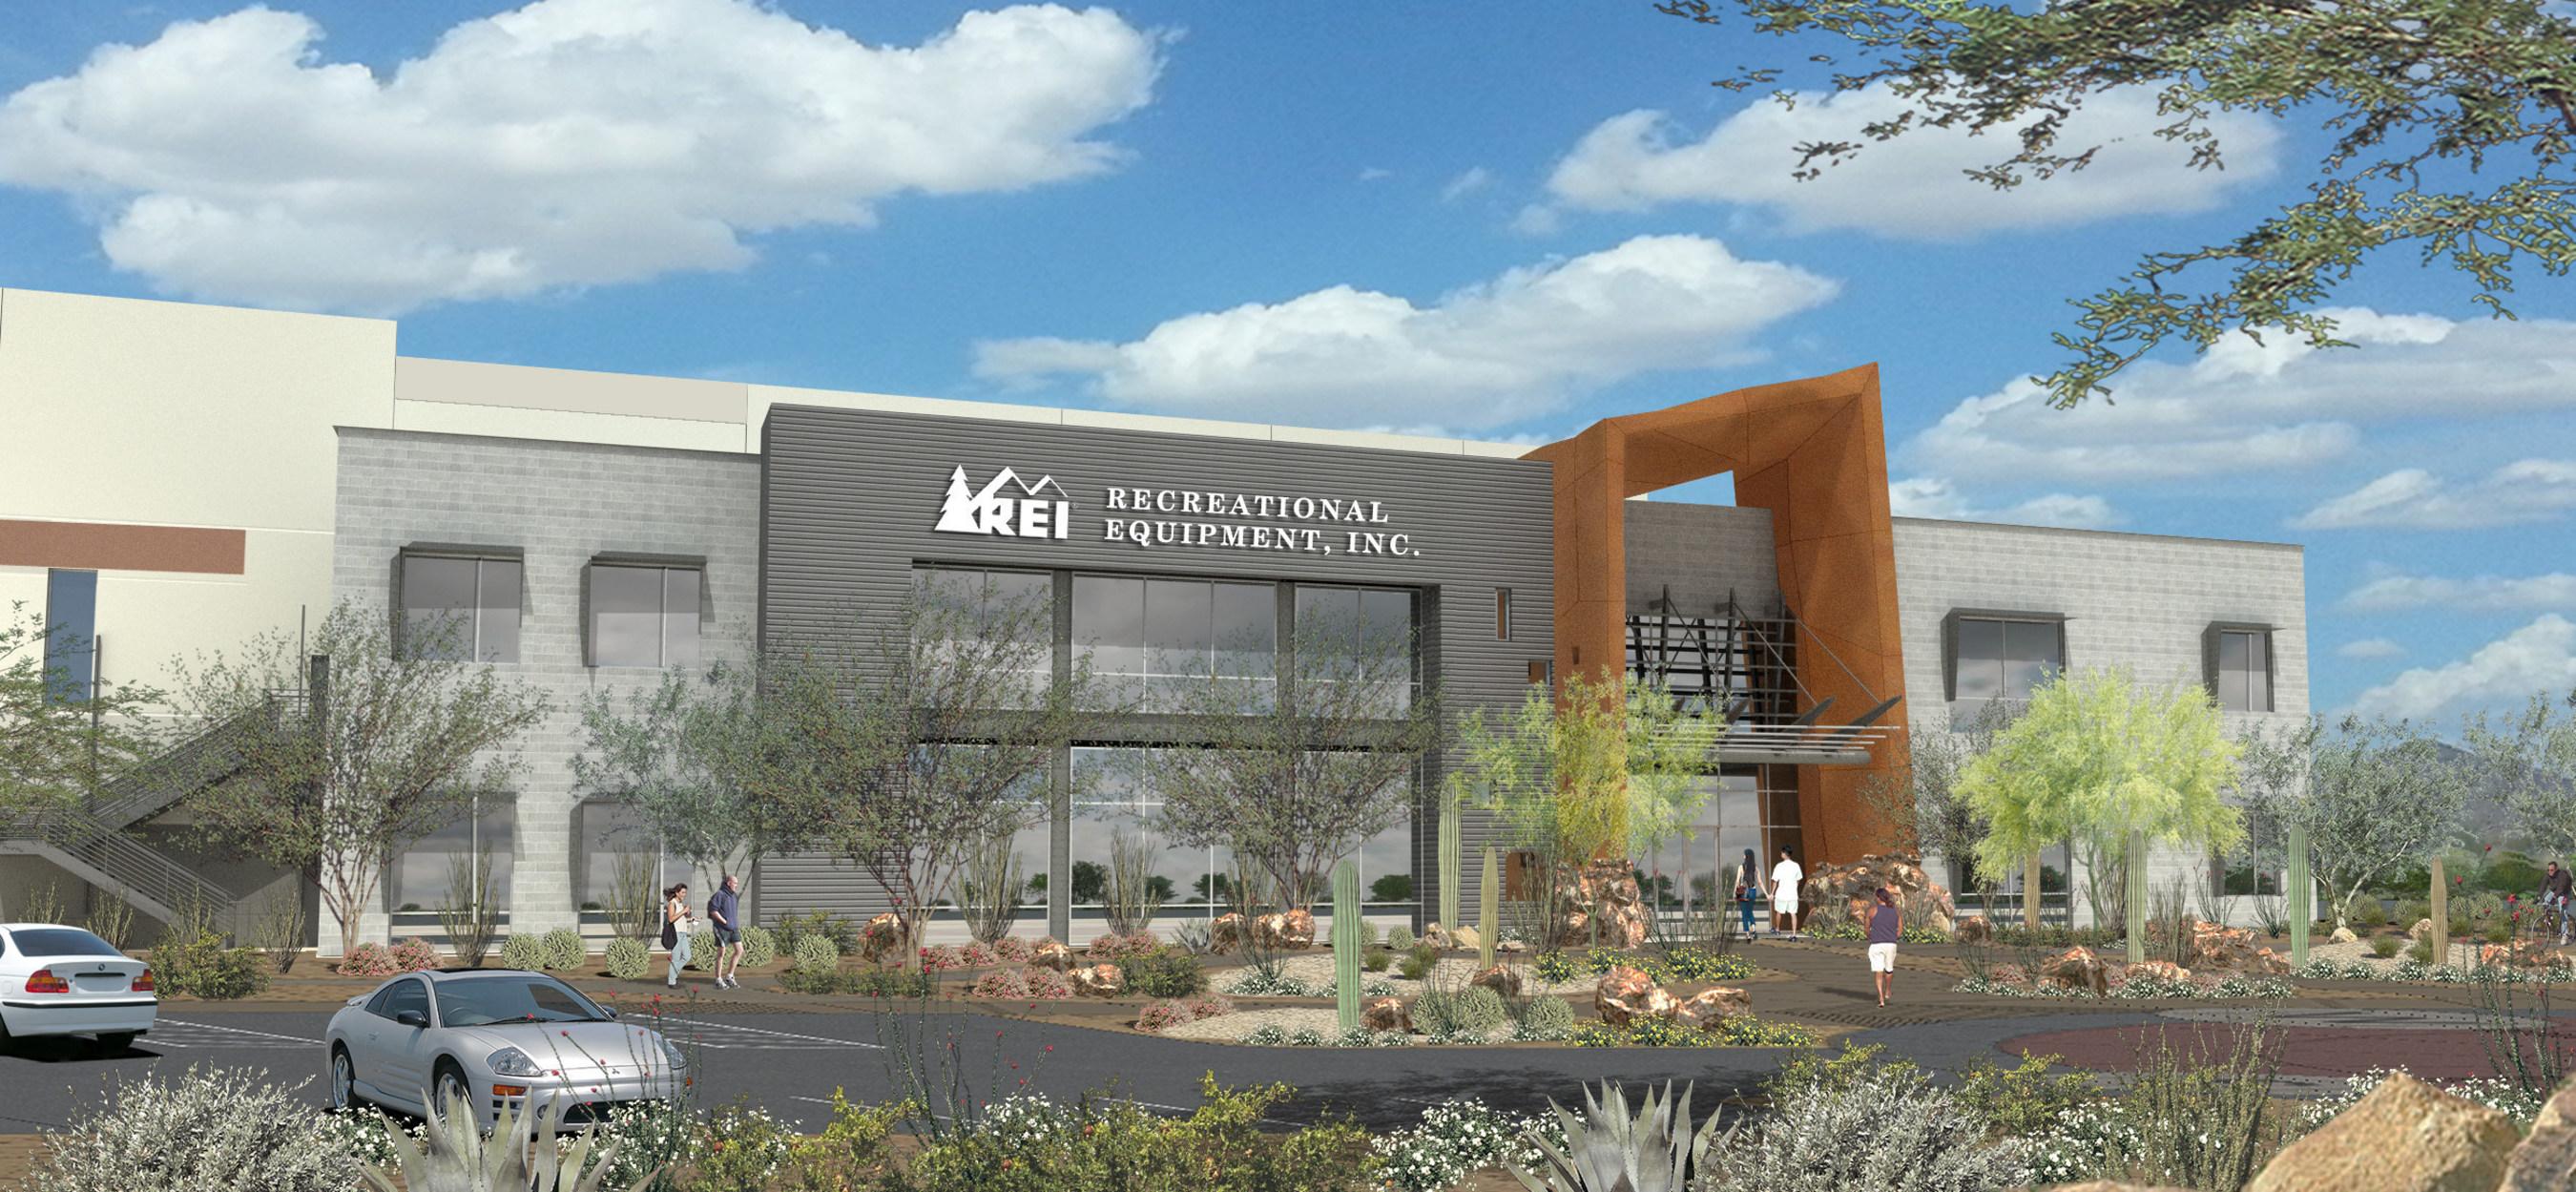 REI's distribution center in Goodyear, Arizona (opening July 2016).